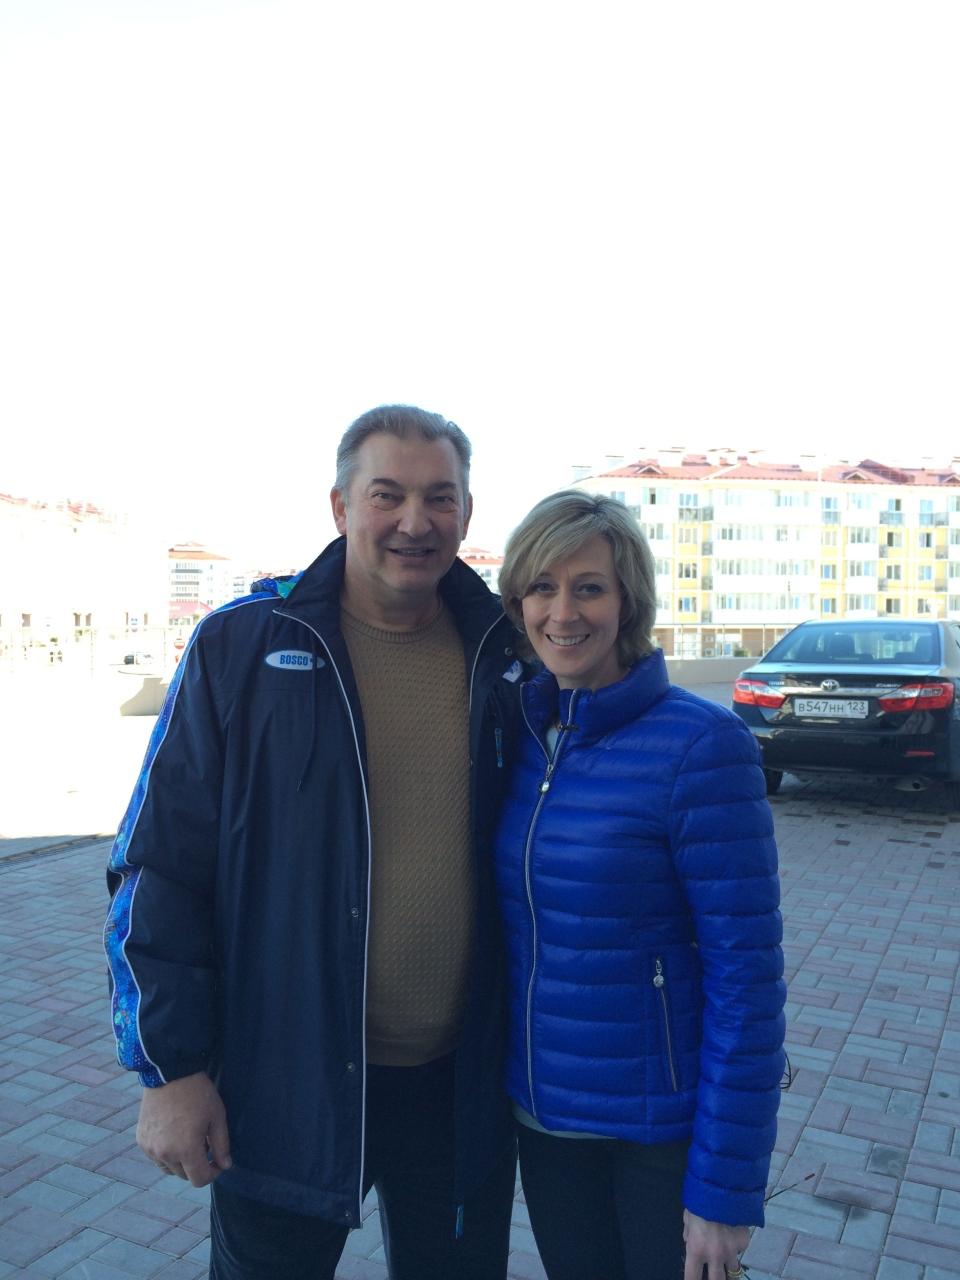 CTV's Genevieve Beauchemin poses with Russian goaltending legend Vladislav Tretia in Sochi, Russia Thursday, Feb. 13, 2014.